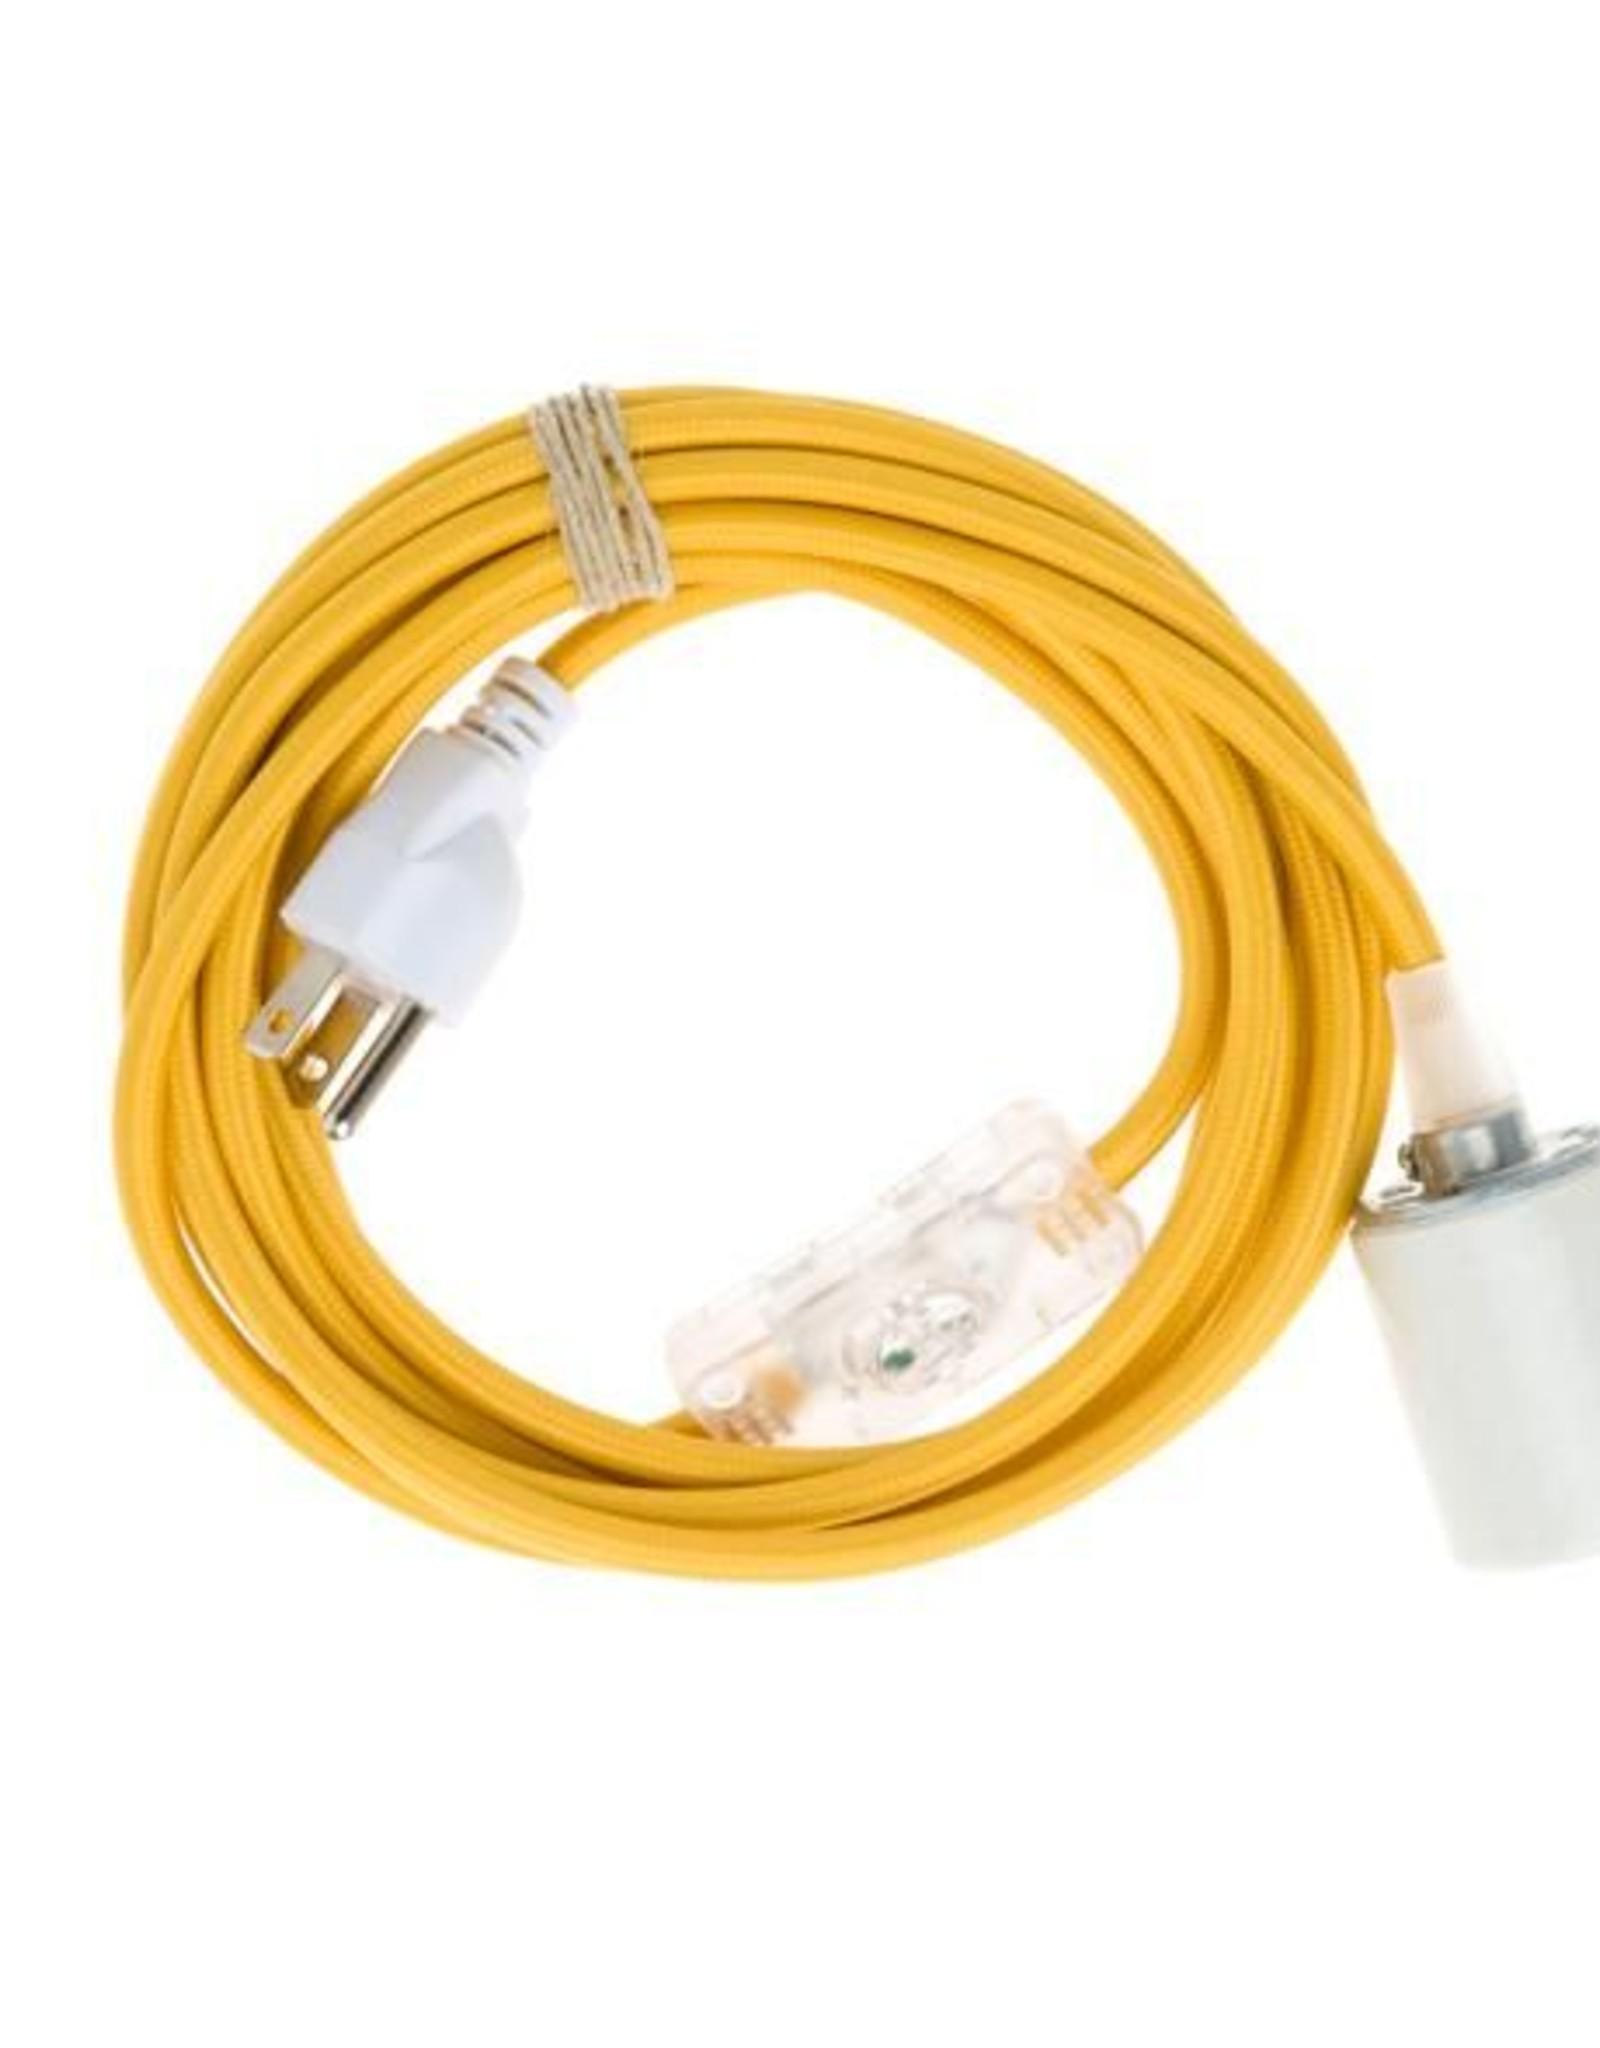 Color Cord Company Porcelain Plug-In Cord Set - Goldenrod